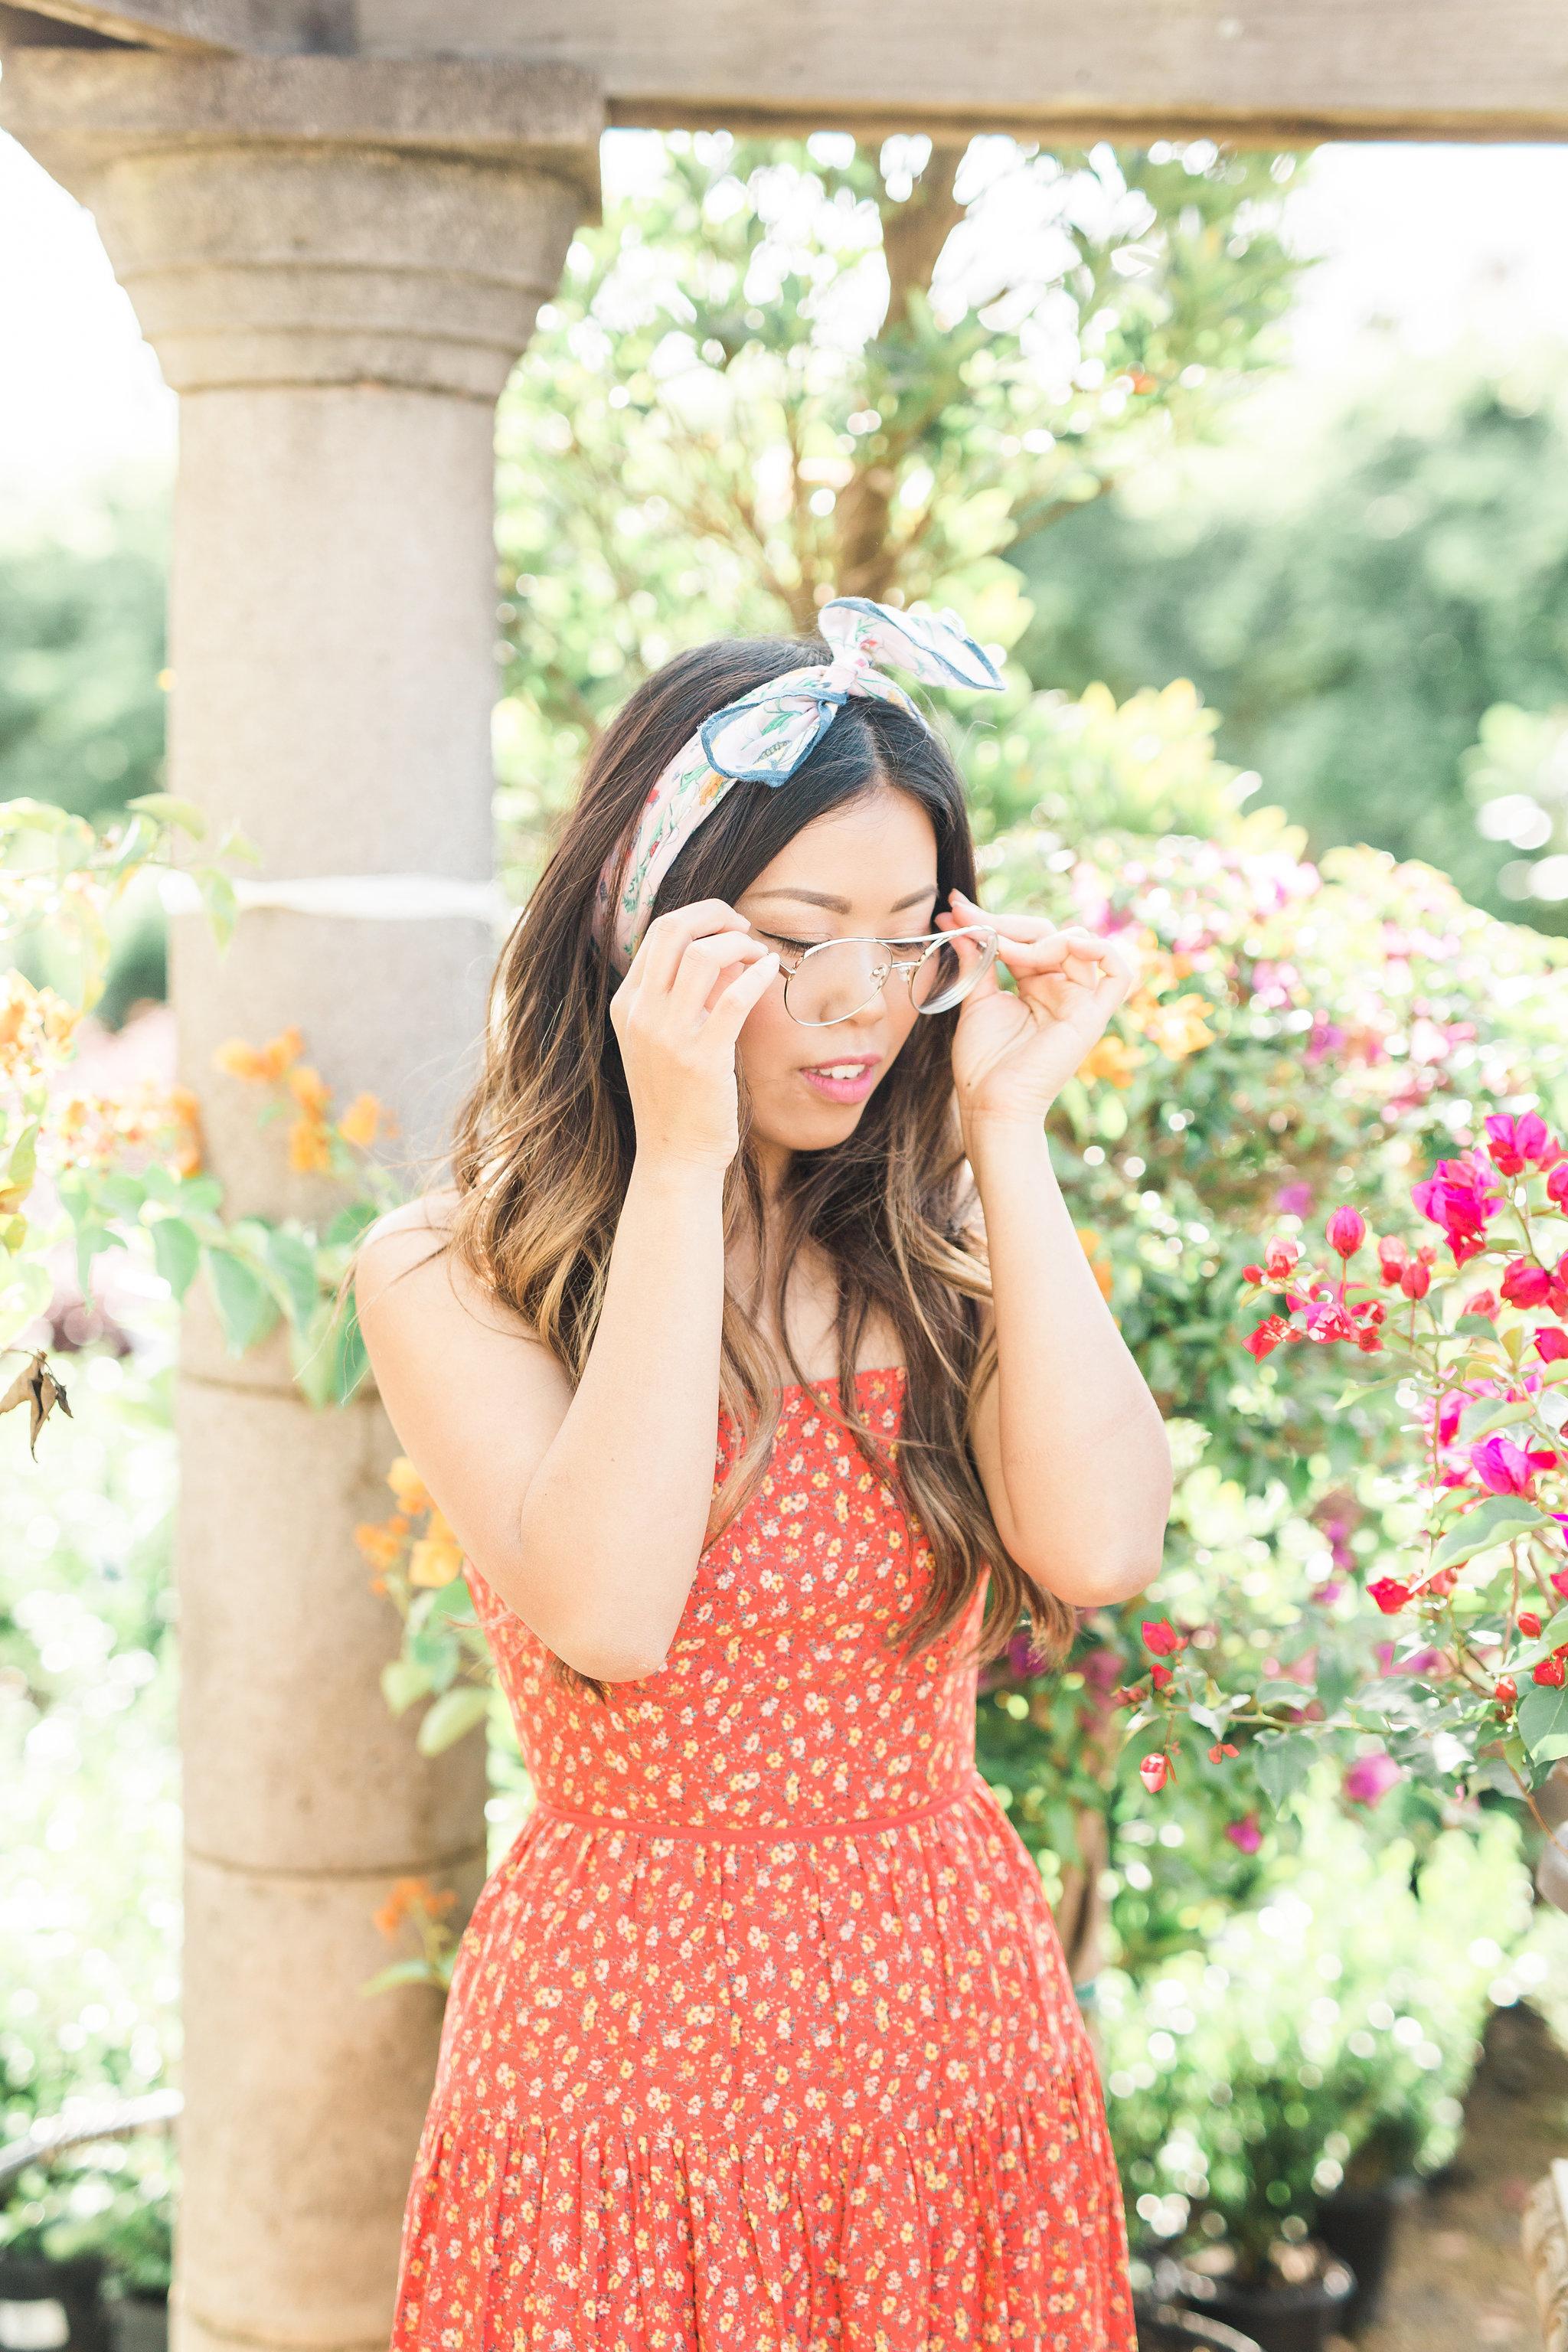 Best Spring Women's Fashion Prescription Eye Glasses Eyeconic Joyfullygreen Chloe Aviators 10.jpg